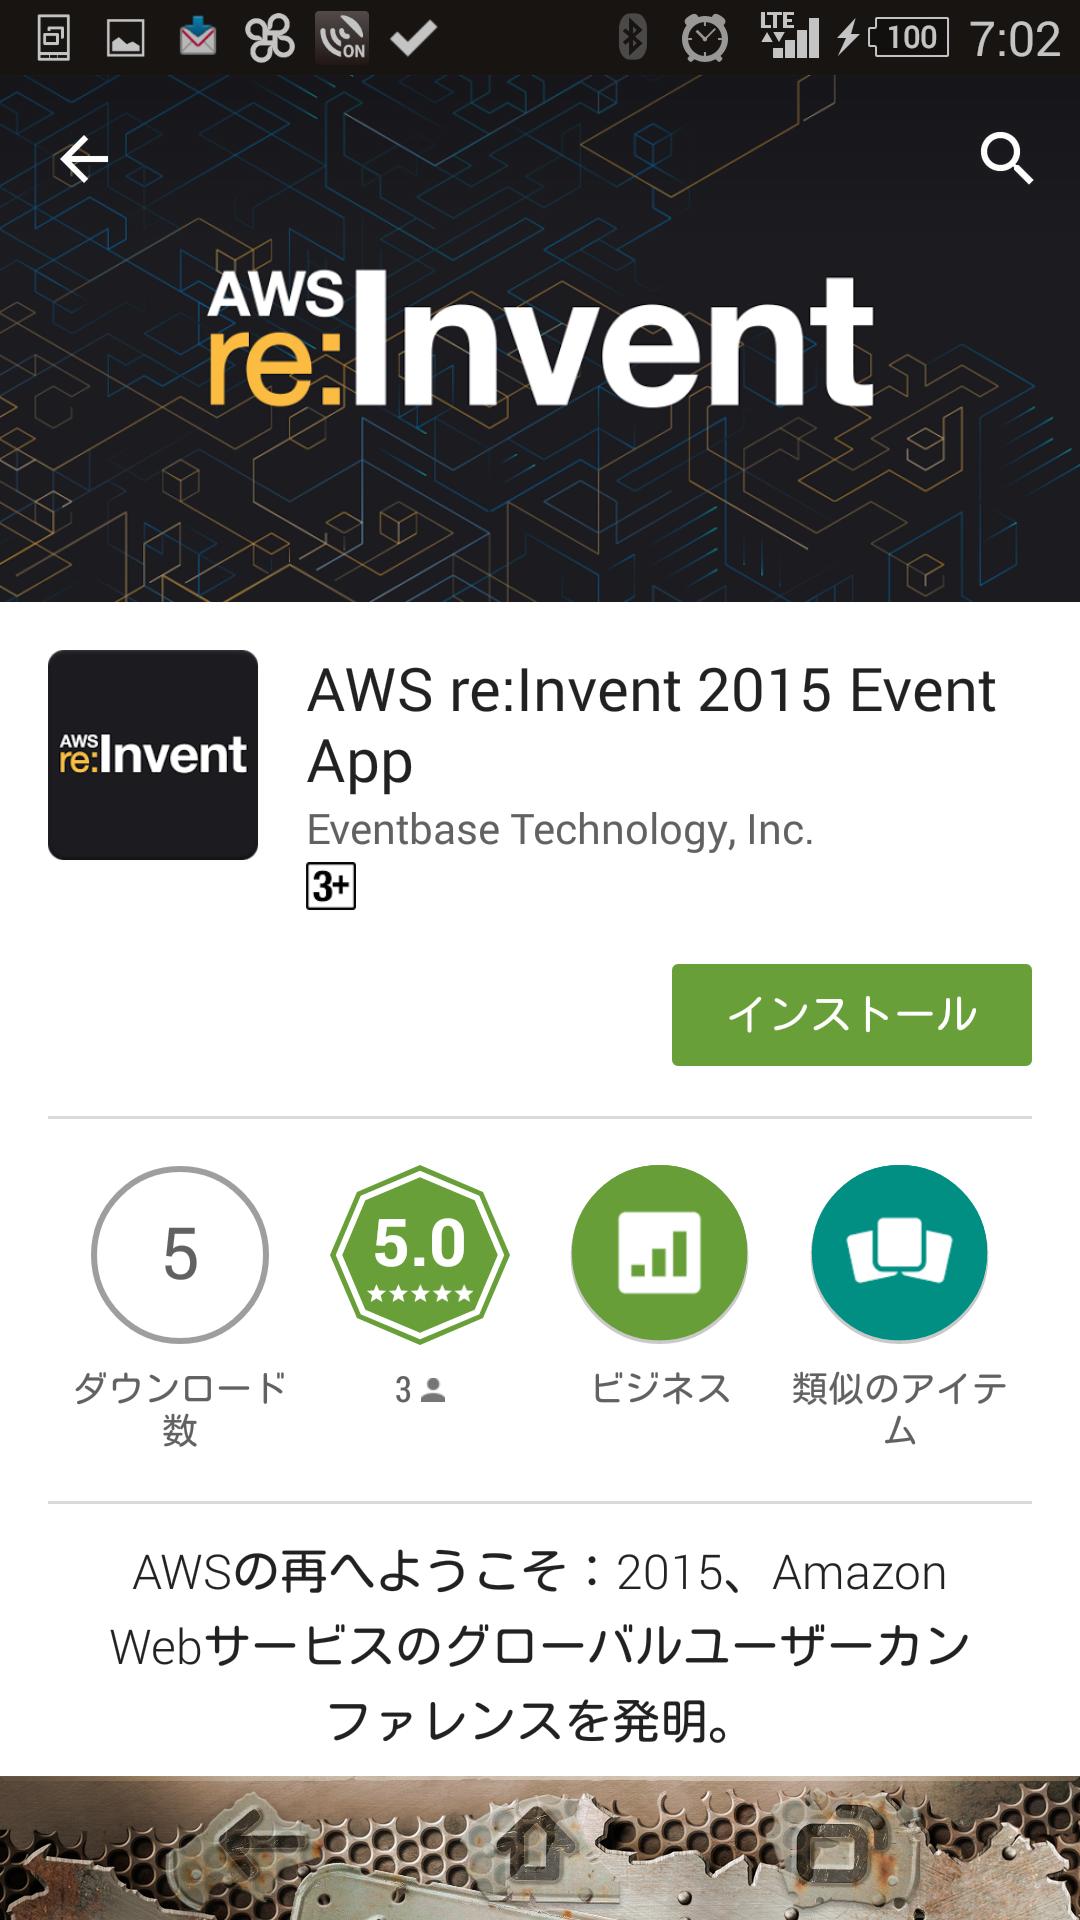 aws-reinvent-2015-event-app_02